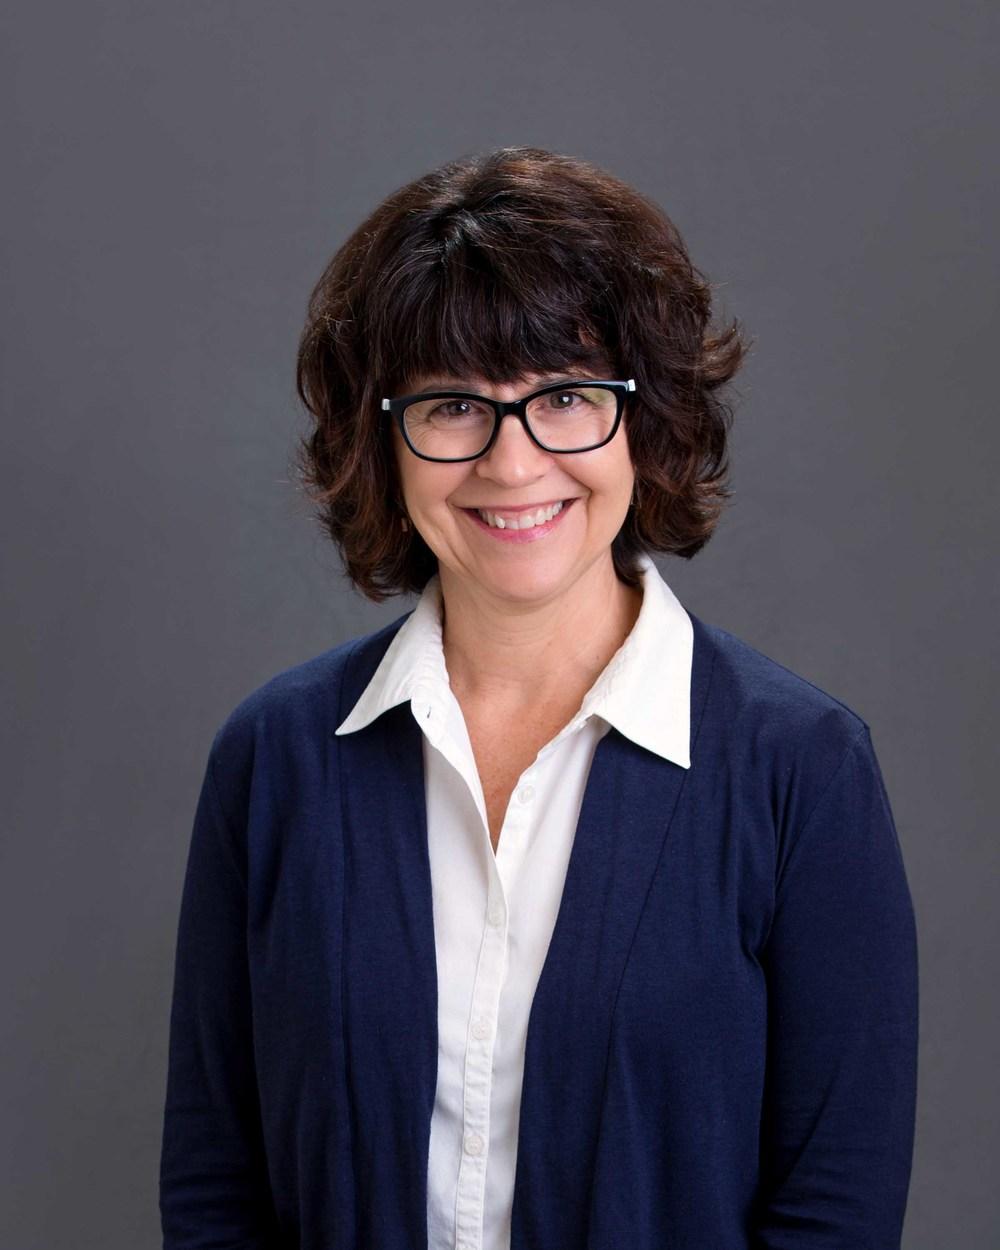 Danette Ivie, Executive Administrative Assistant